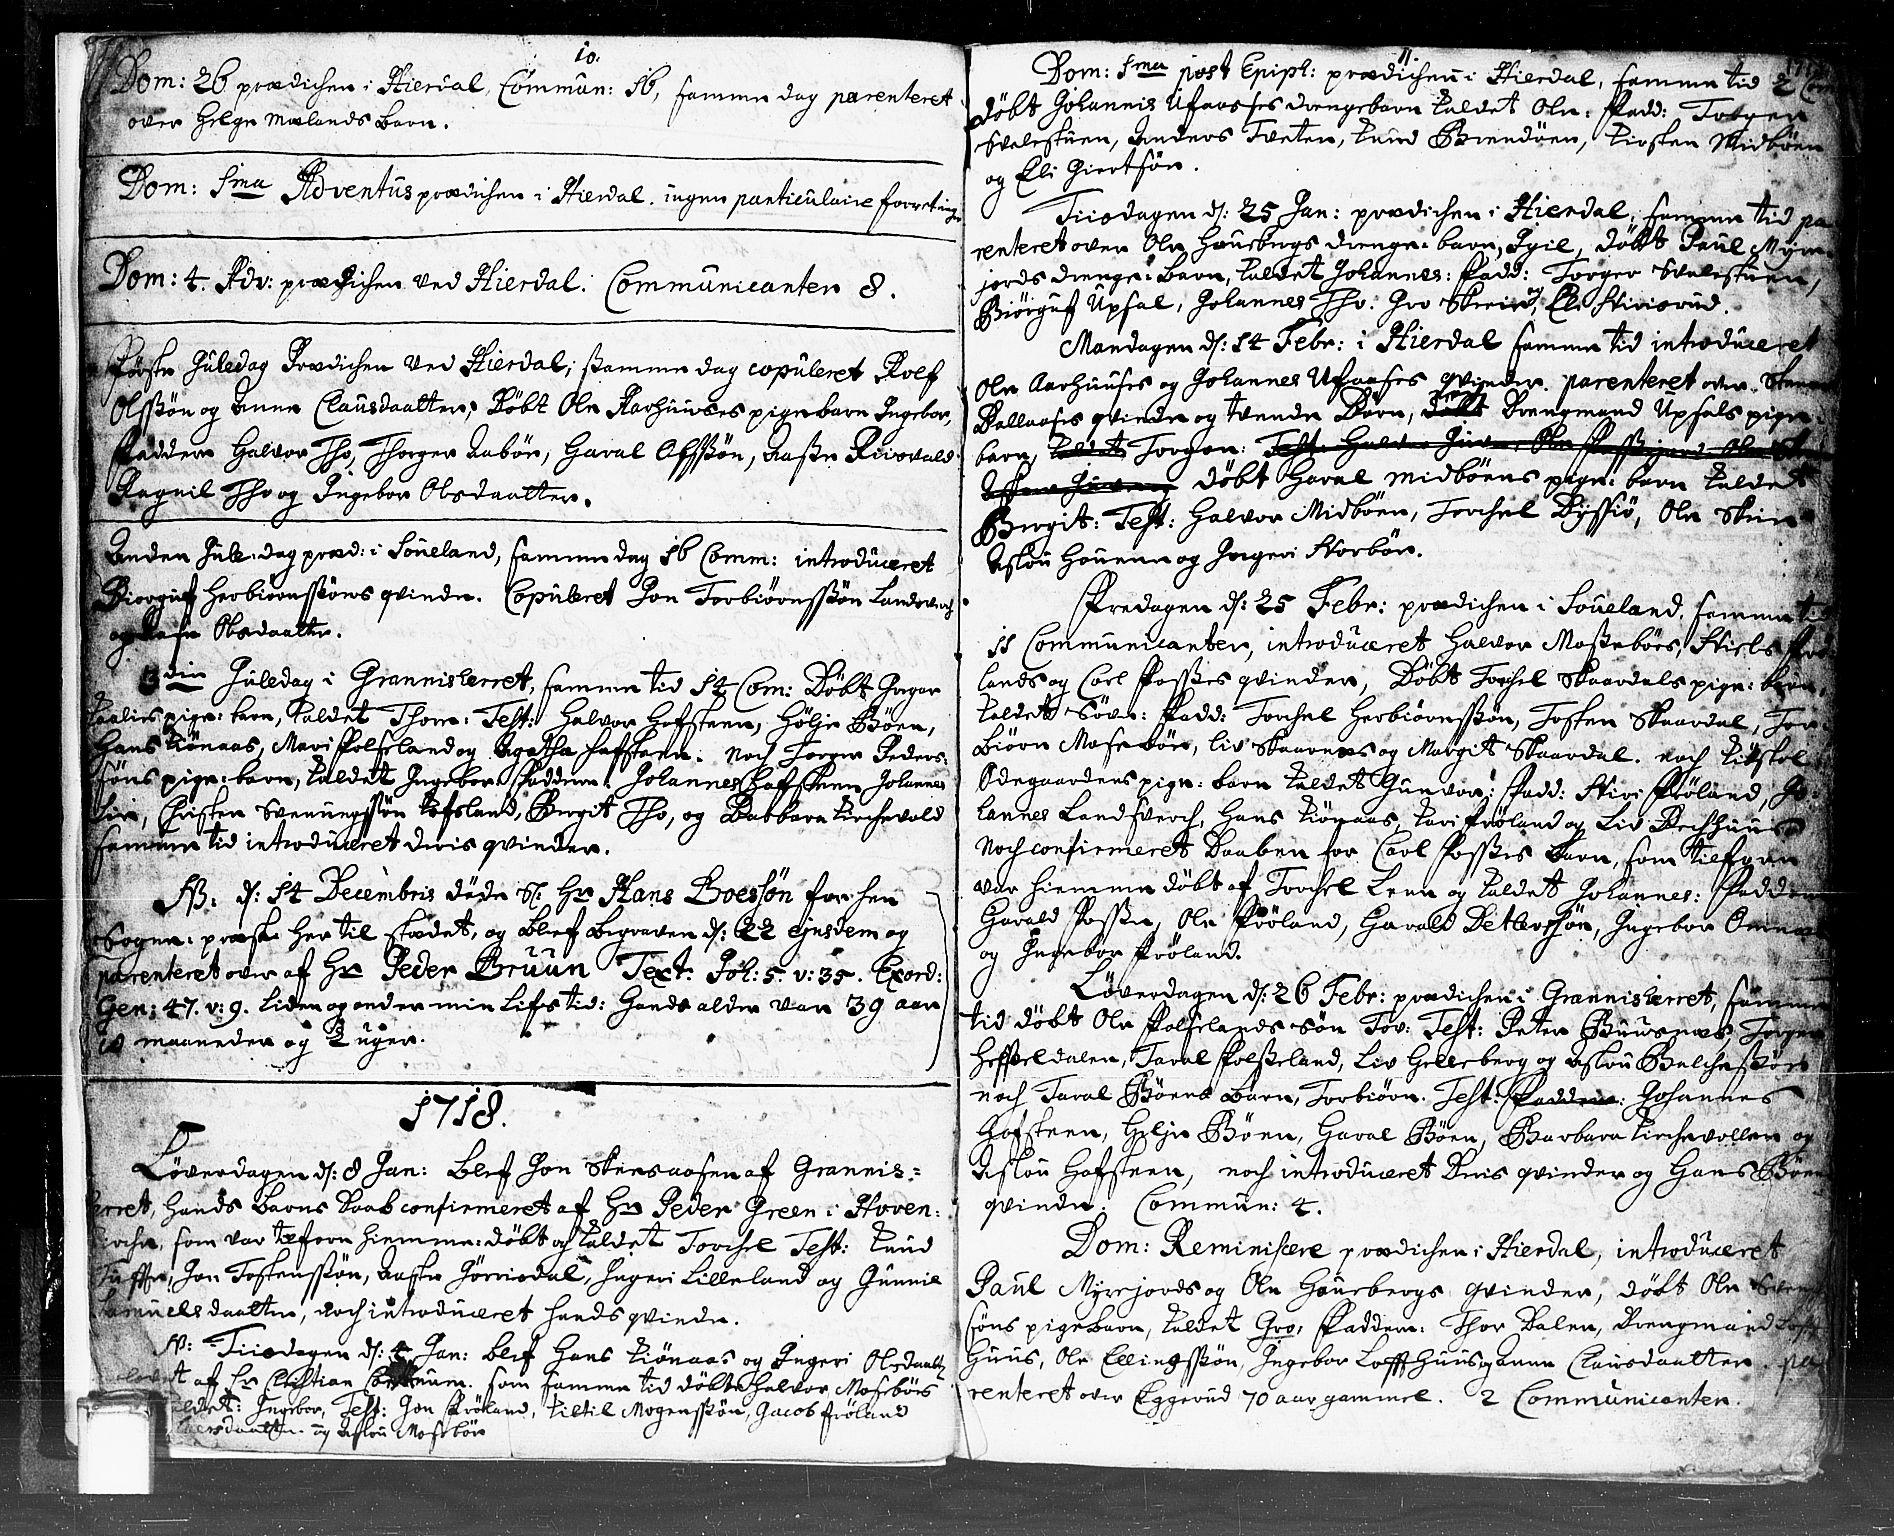 SAKO, Hjartdal kirkebøker, F/Fa/L0002: Ministerialbok nr. I 2, 1716-1754, s. 10-11